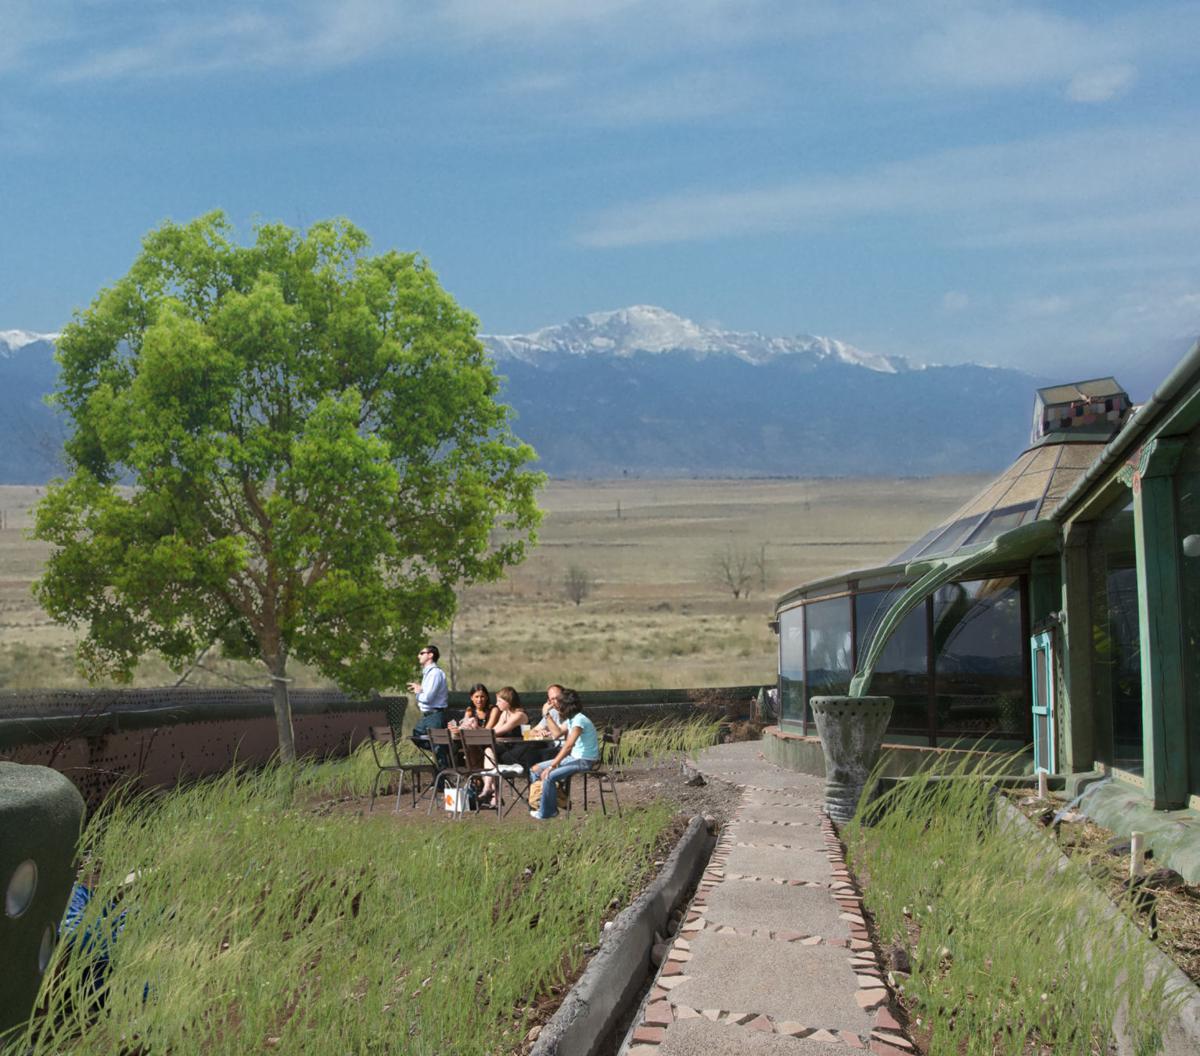 Earthship village will soon land in Colorado Springs